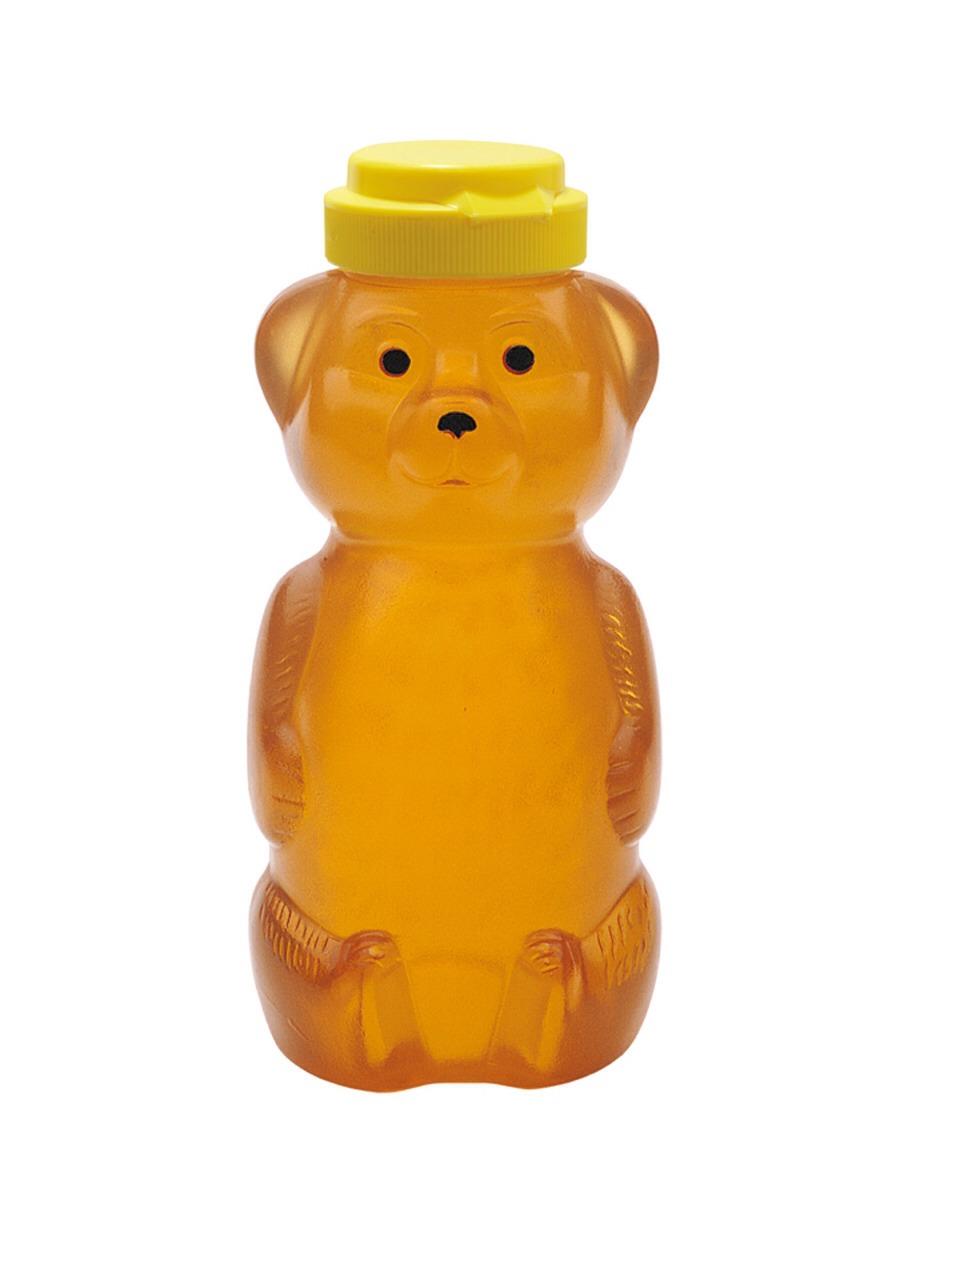 how to keep honey soft